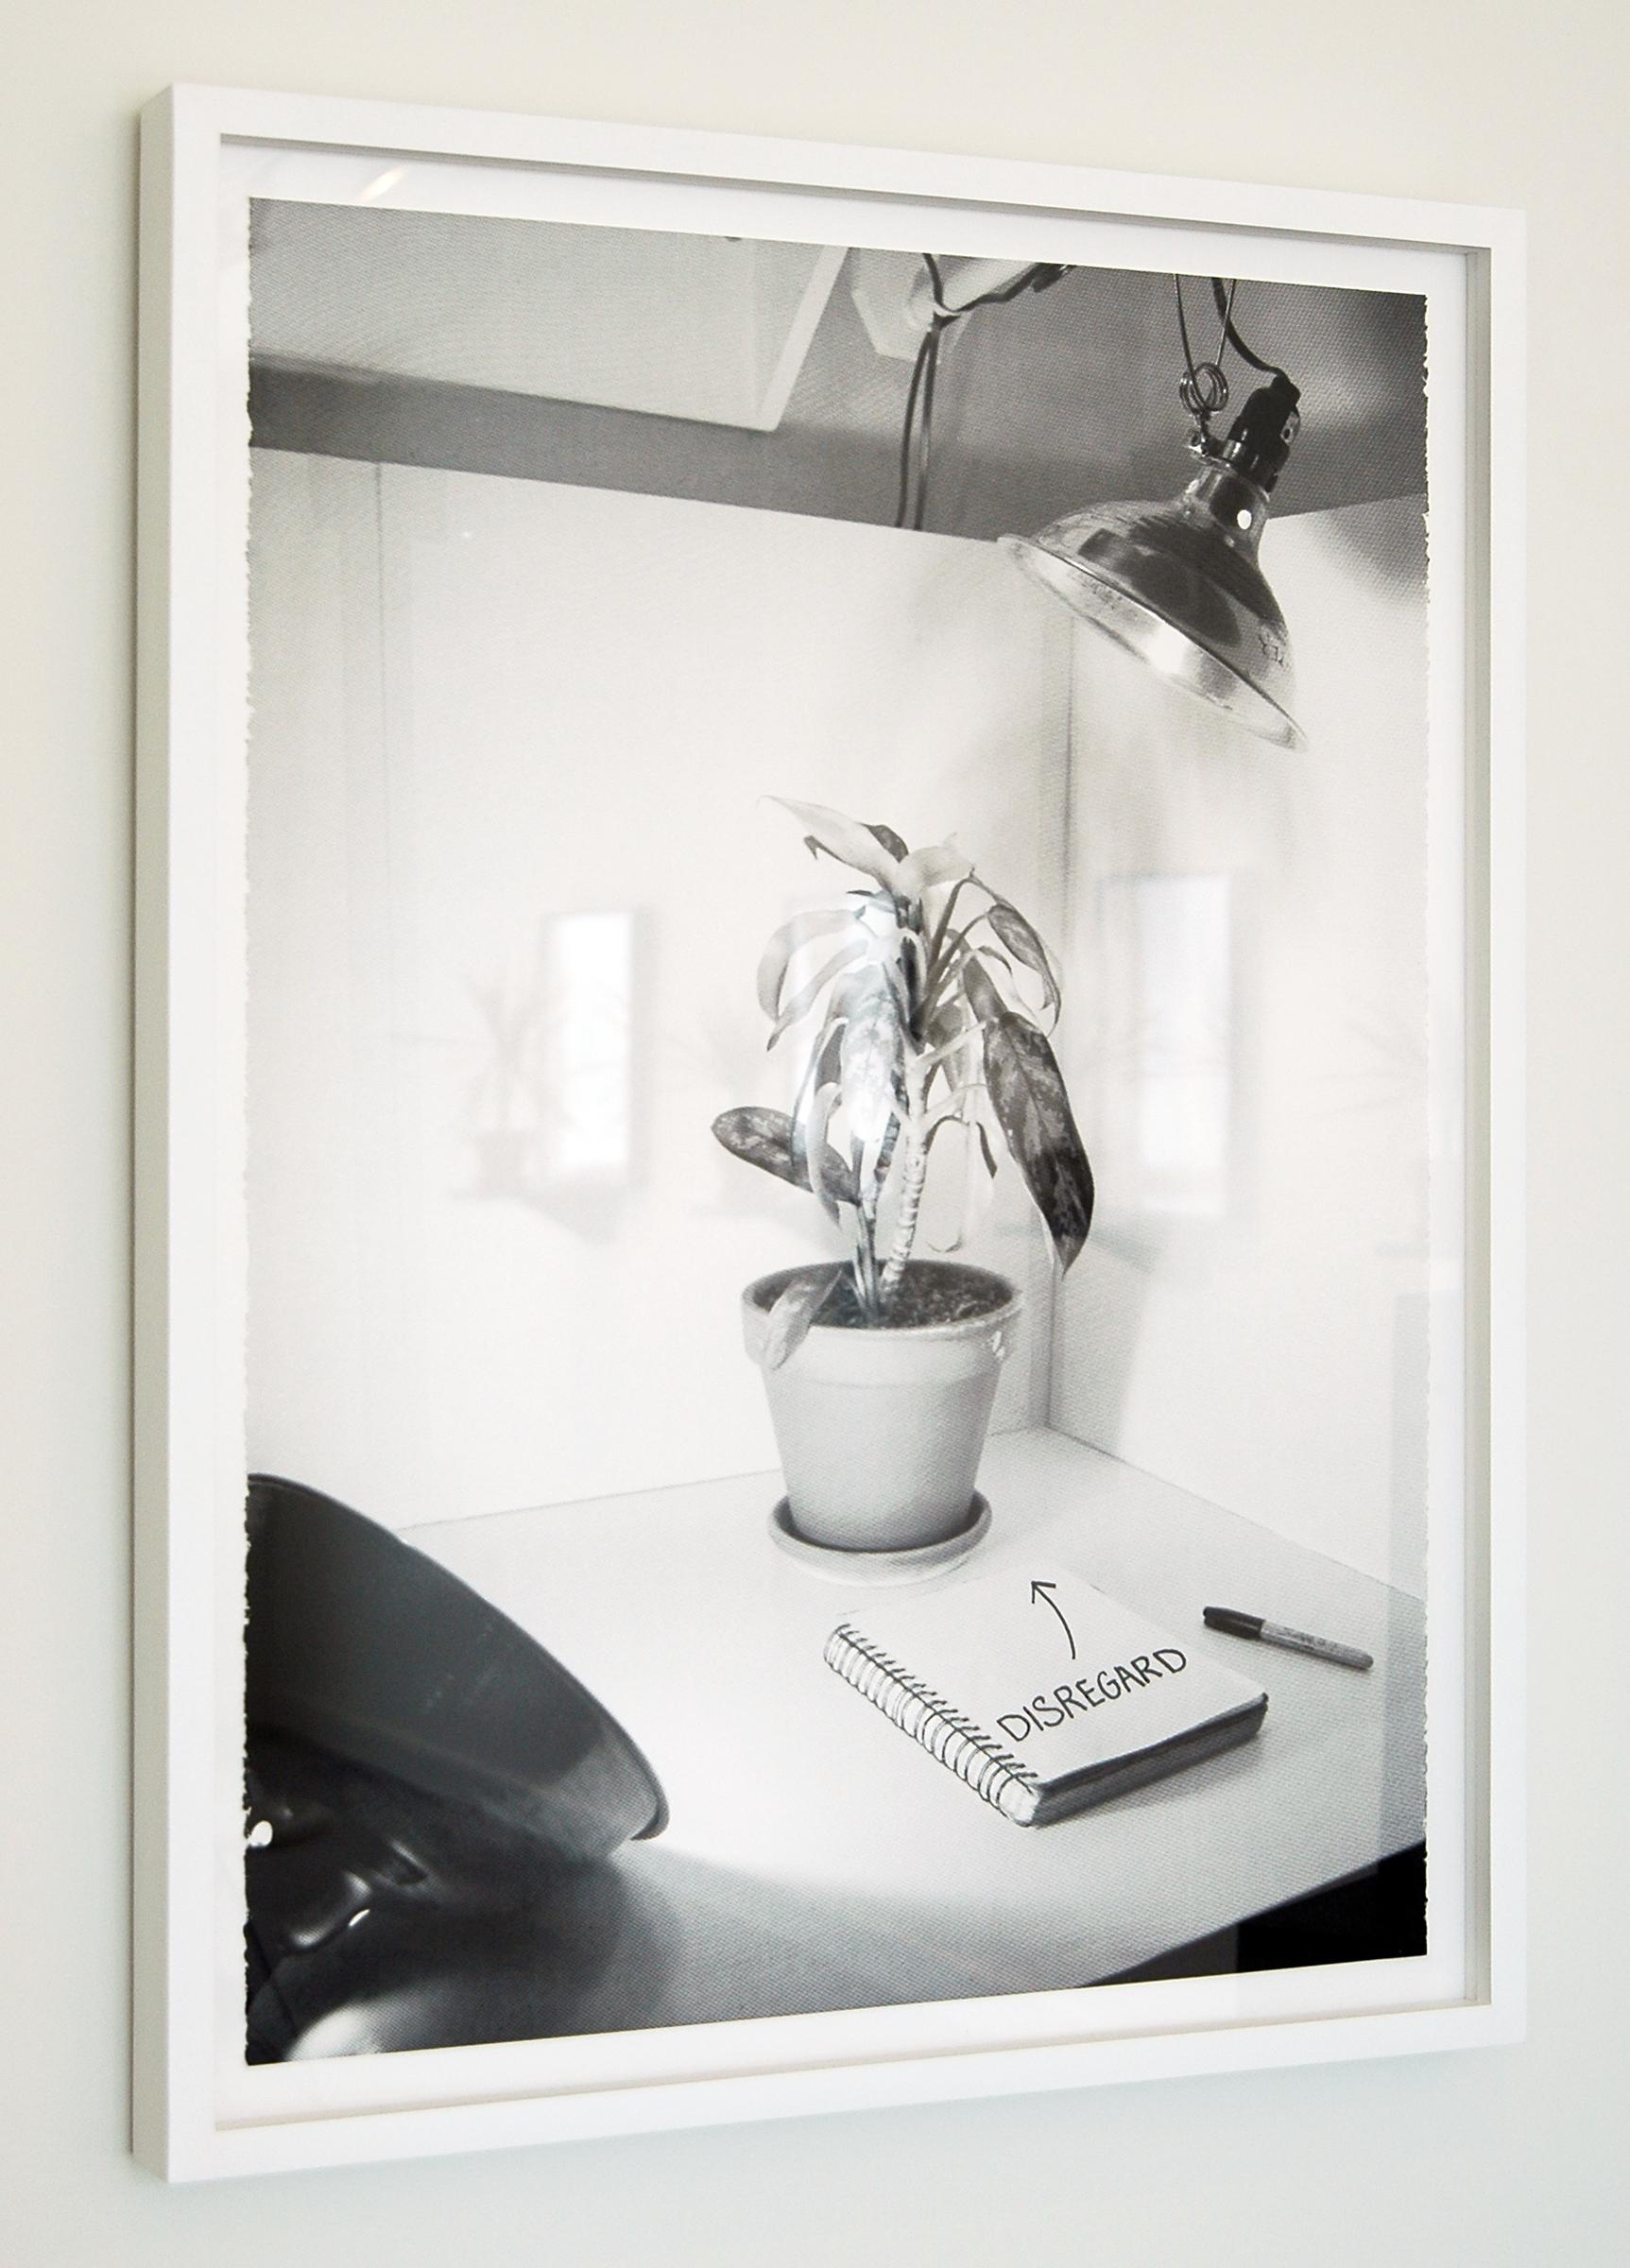 "JOSHUA PIEPER   Disregard , silkscreen and ink on paper, 33"" x 25"" (framed), edition of 10 + 1AP + 2PP, 2012"